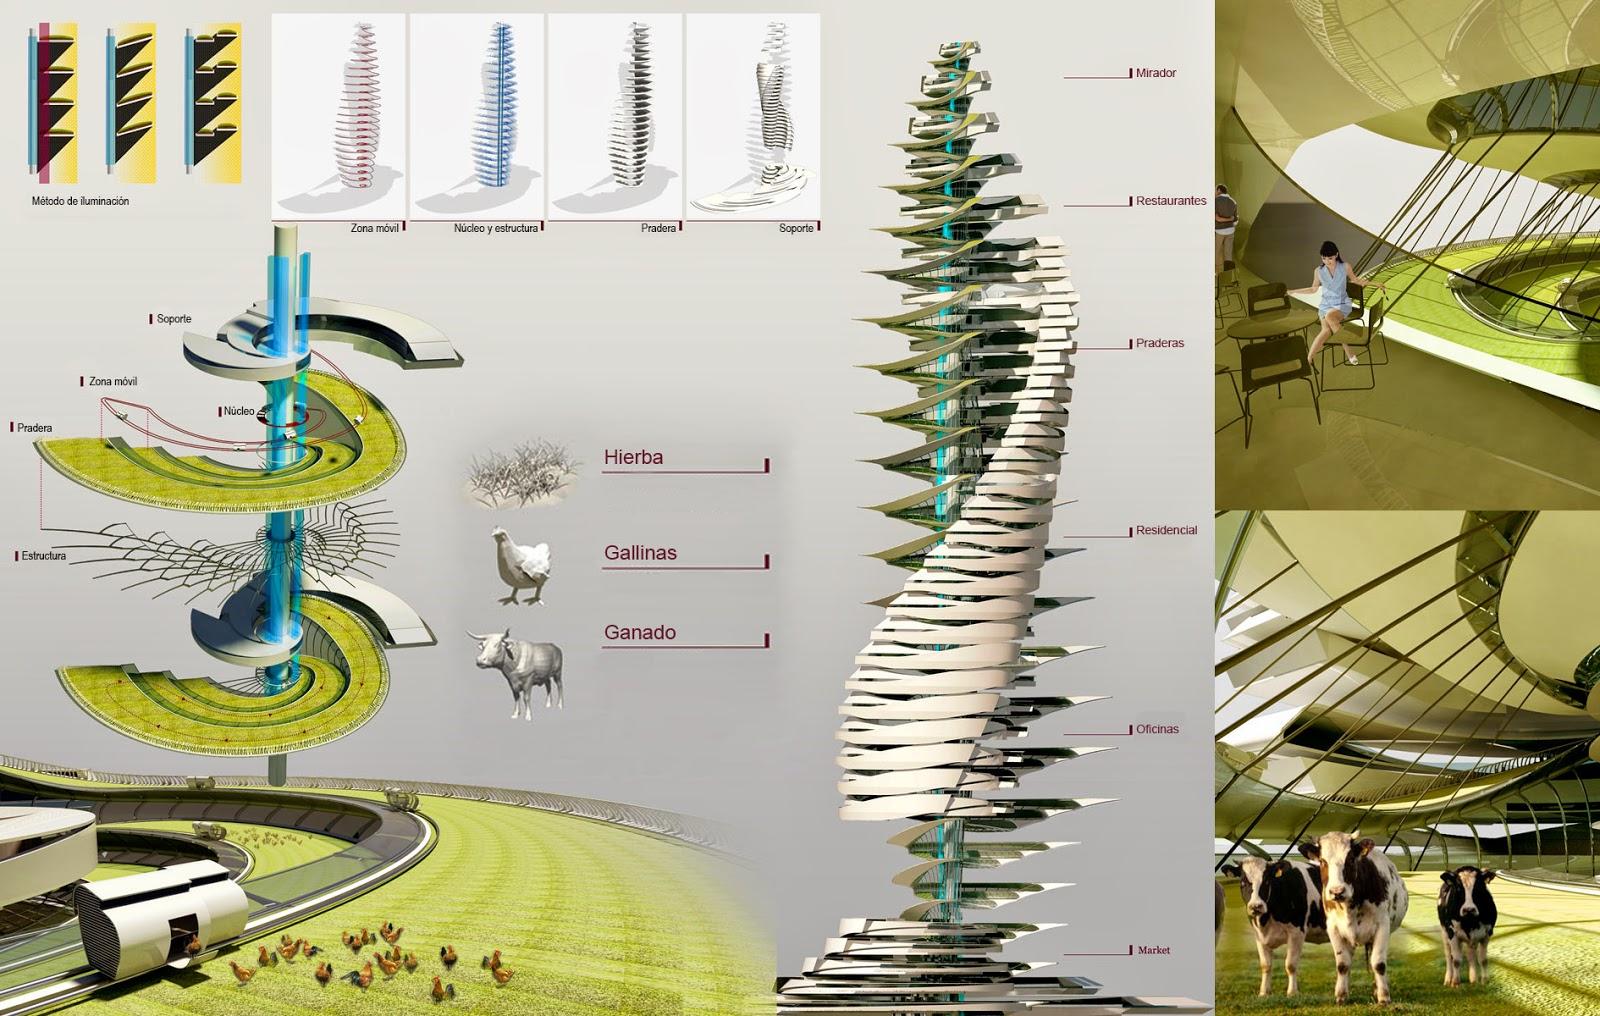 proyecto de la torre granja simbiosis